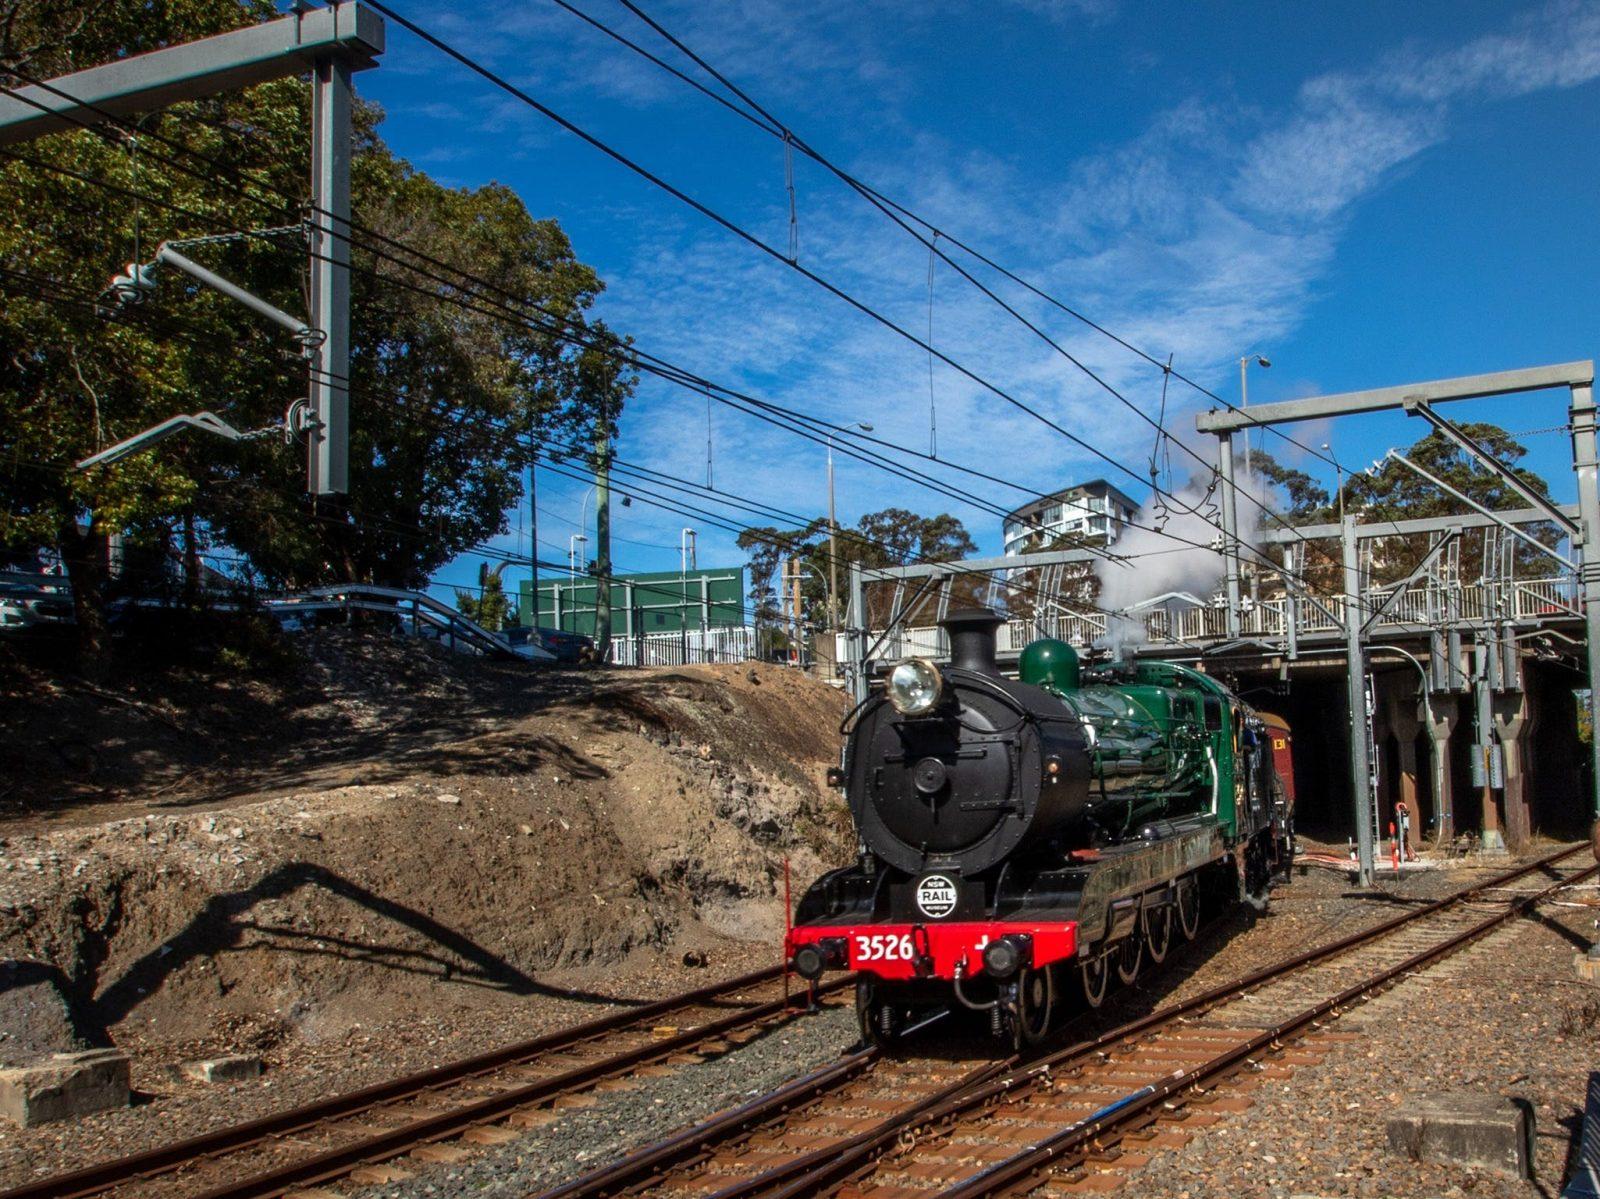 Hornsby Steam Shuttle